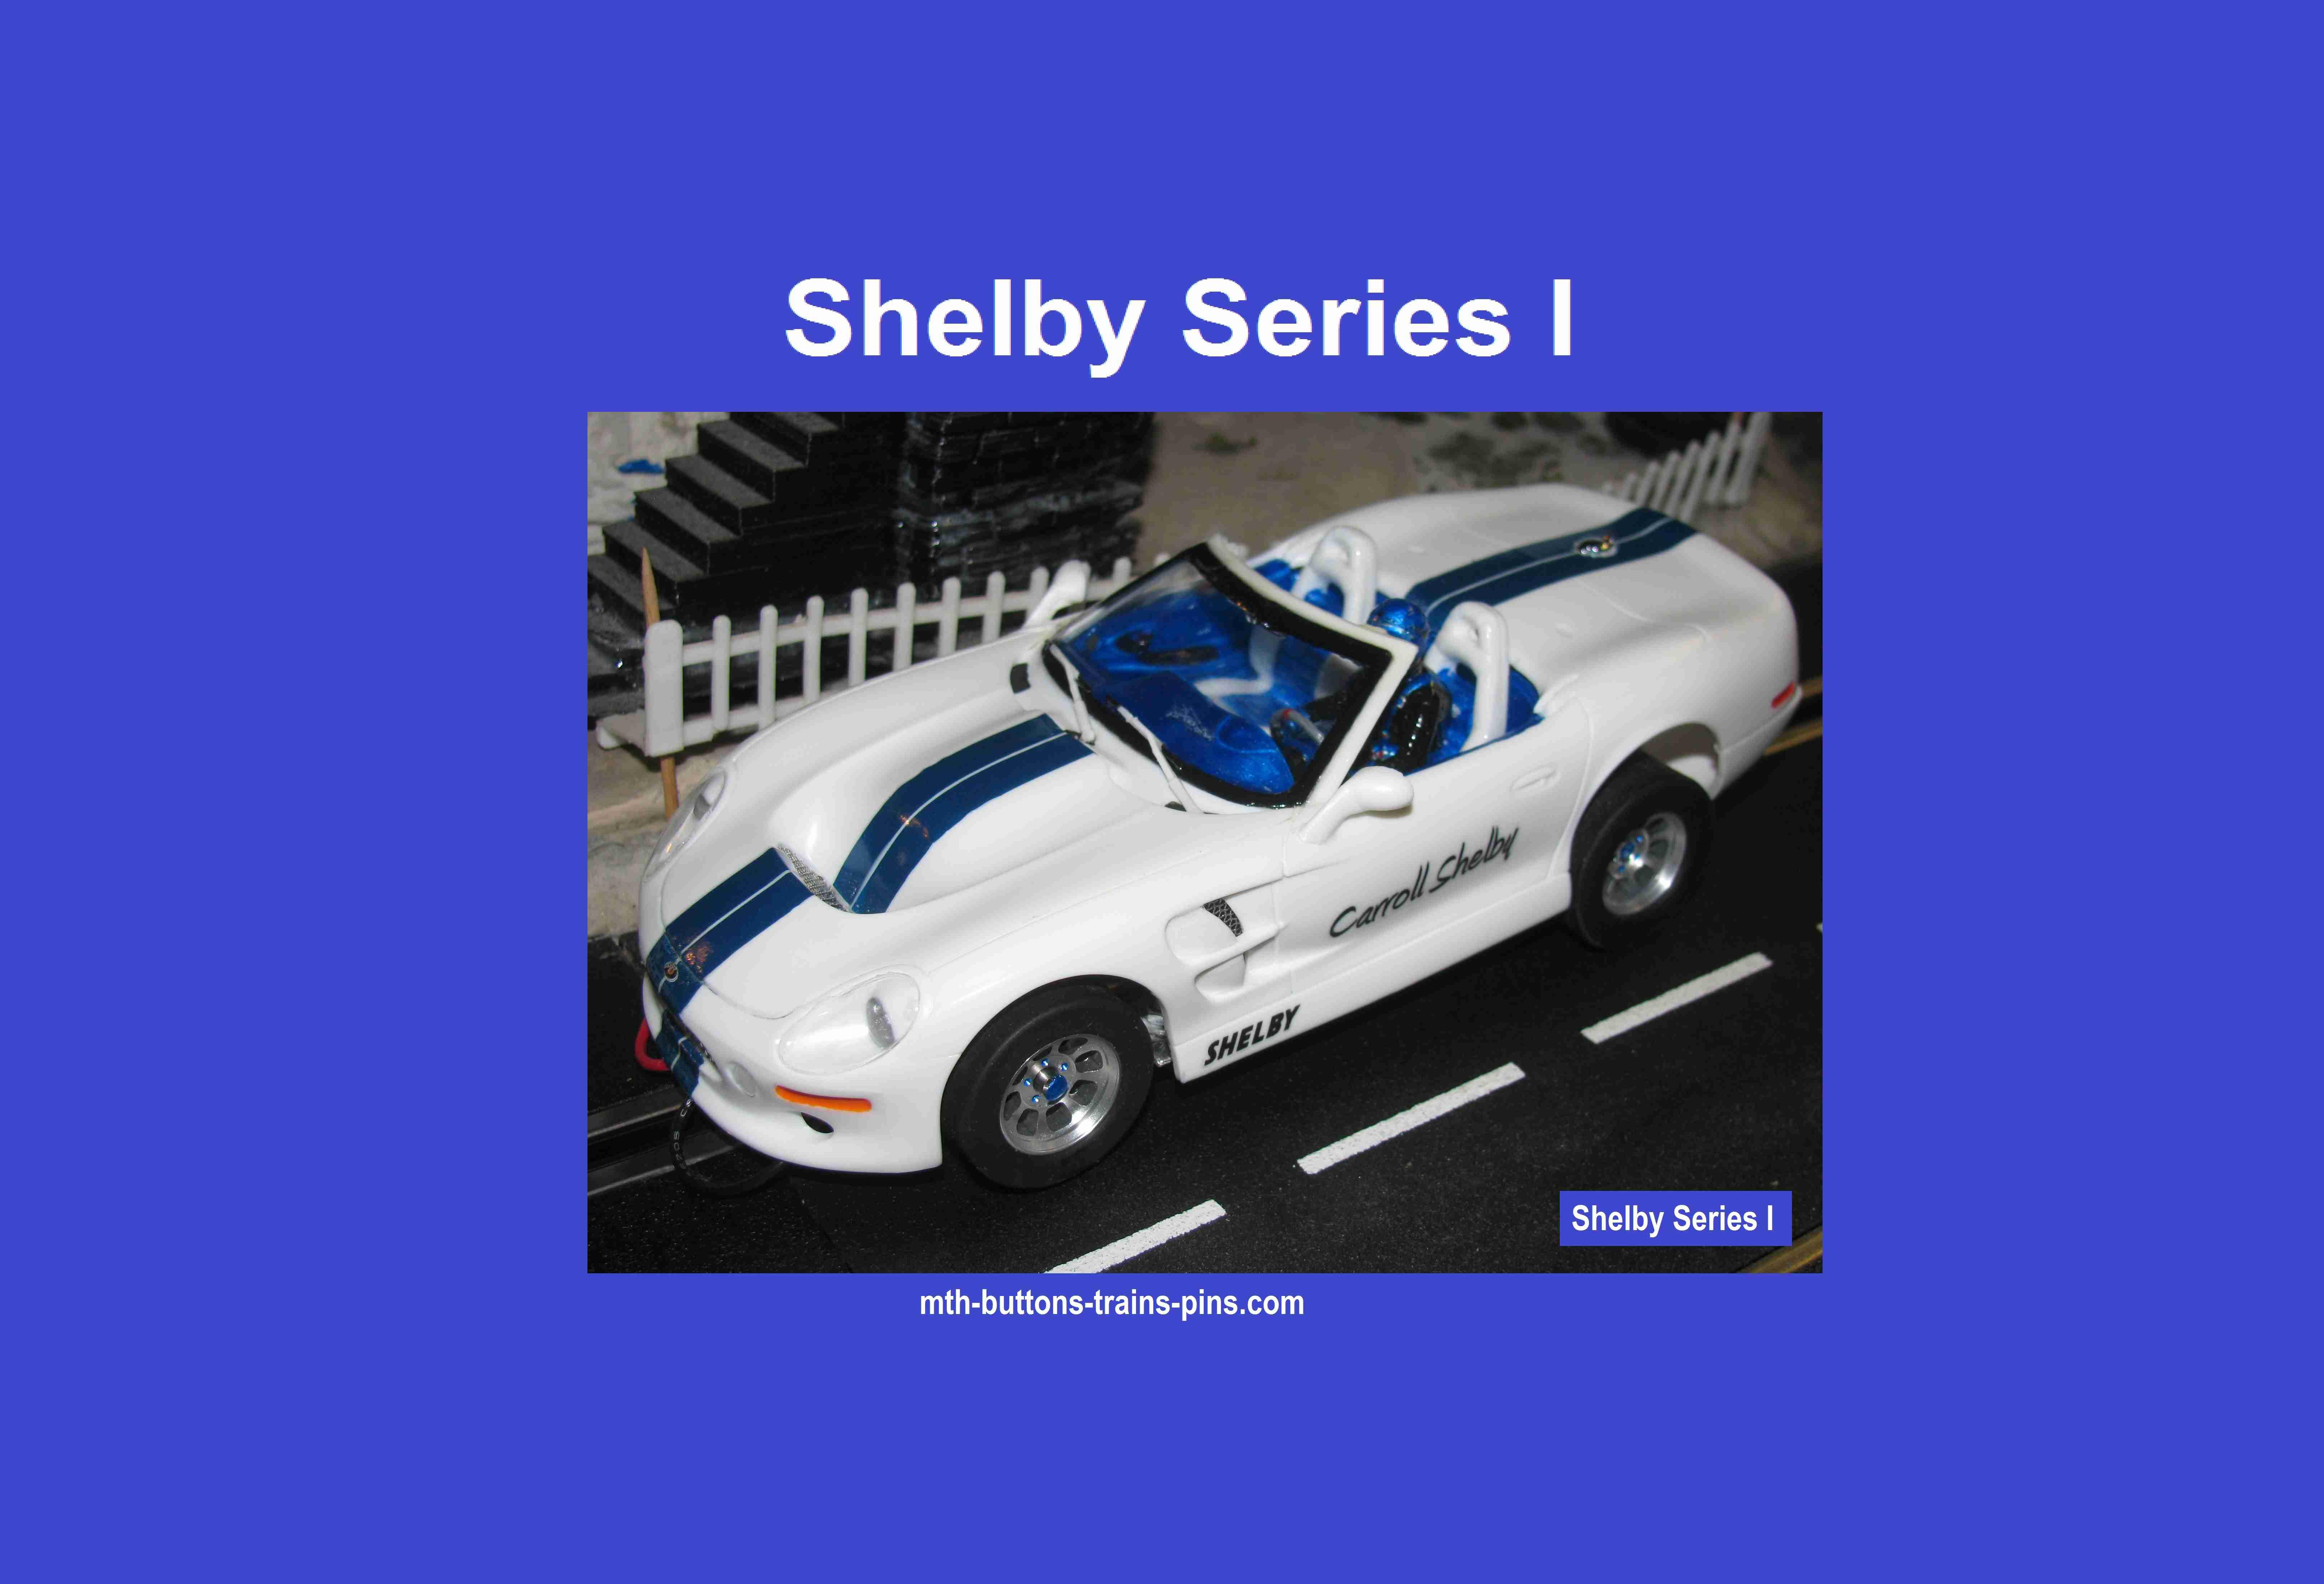 * Super Sale * Monogram 1998 Shelby Series I 1/24 Scale Slot Car